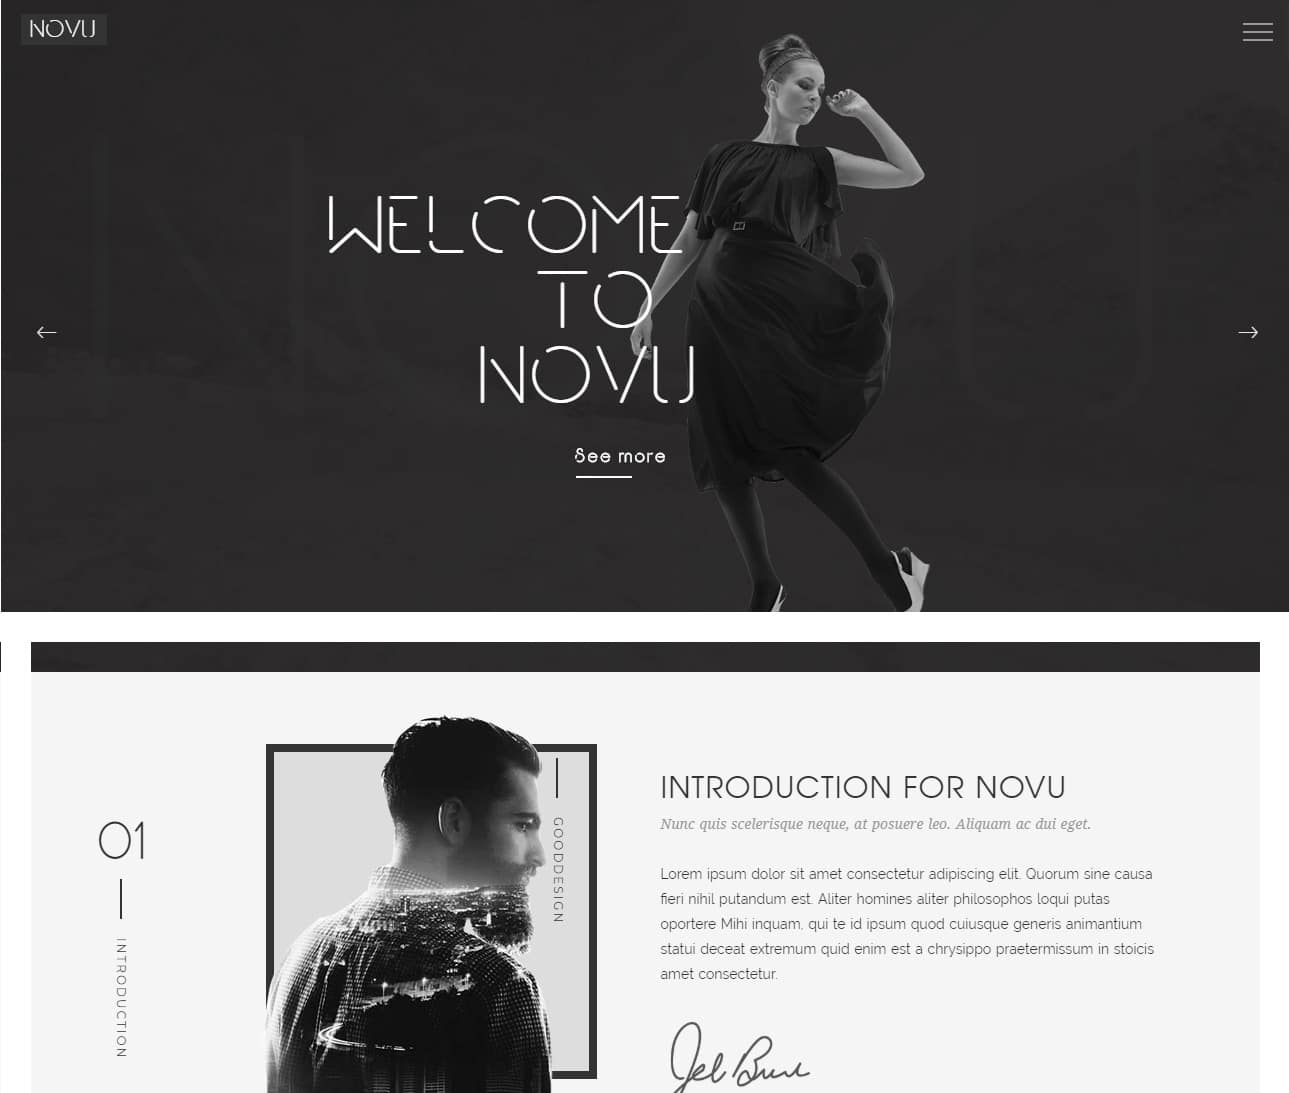 novu-html-landing-page-templates-infographic-design